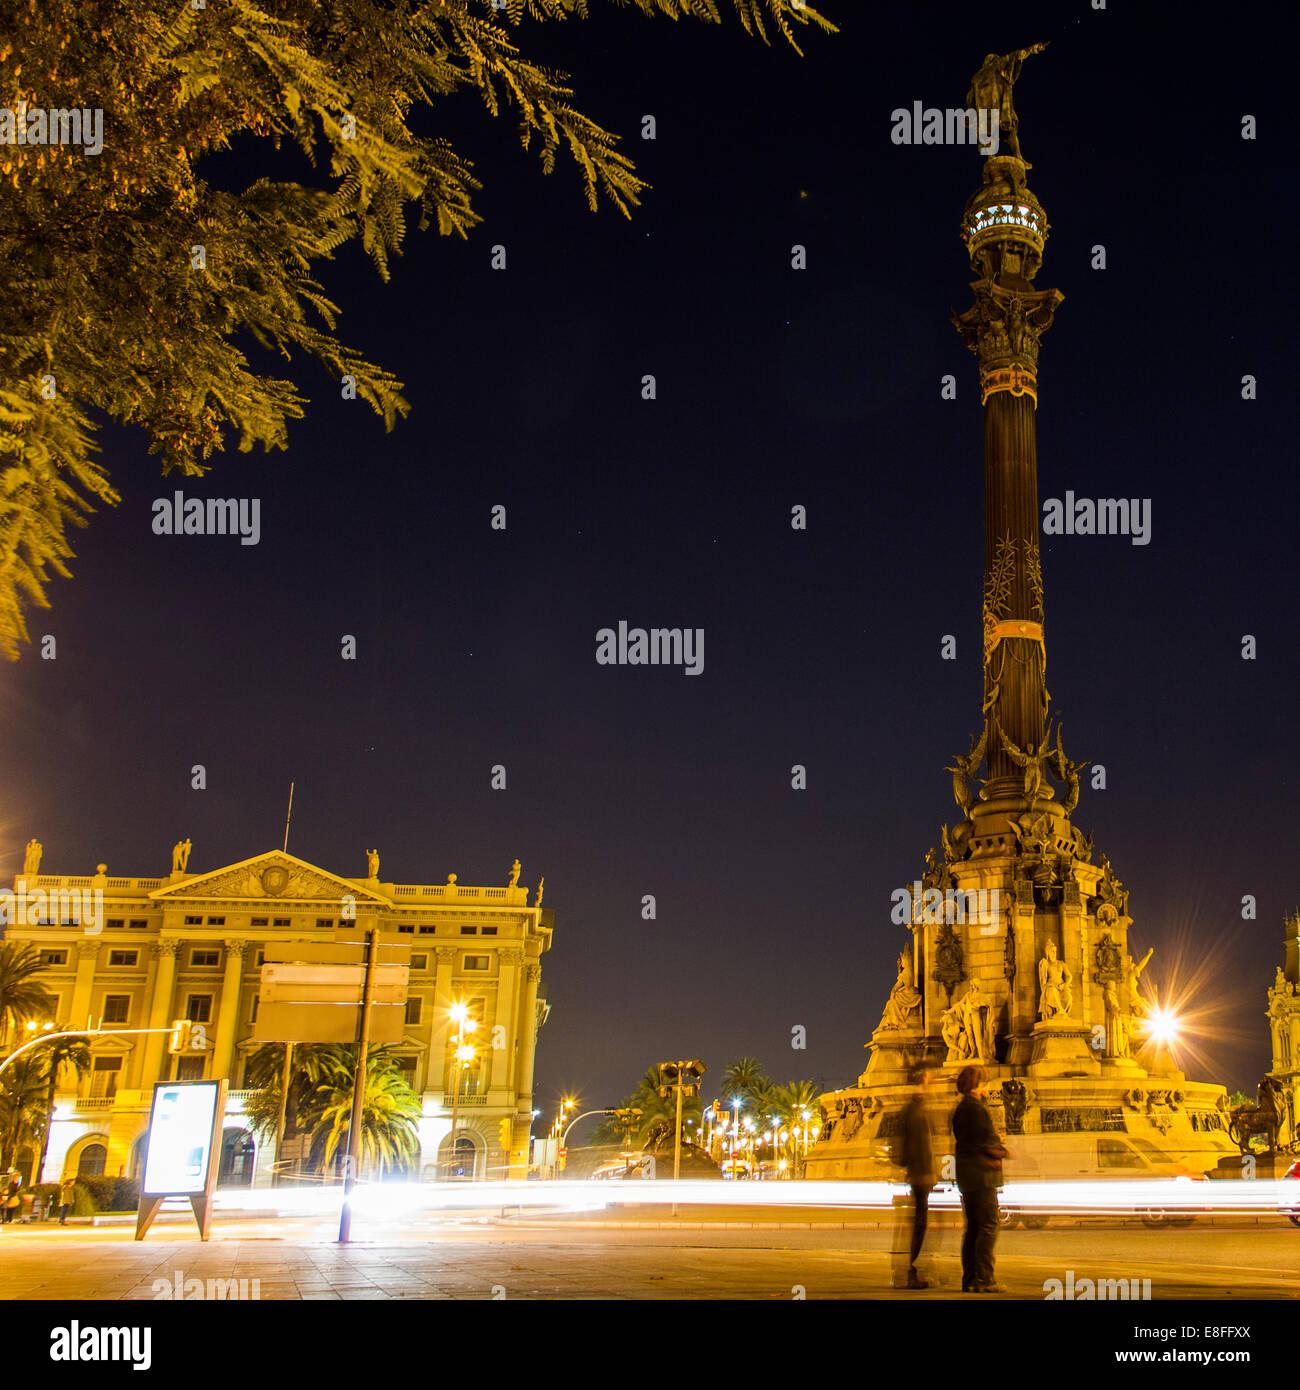 Spanien, Katalonien, Barcelona, Kolumbus-Denkmal in der Nacht Stockbild